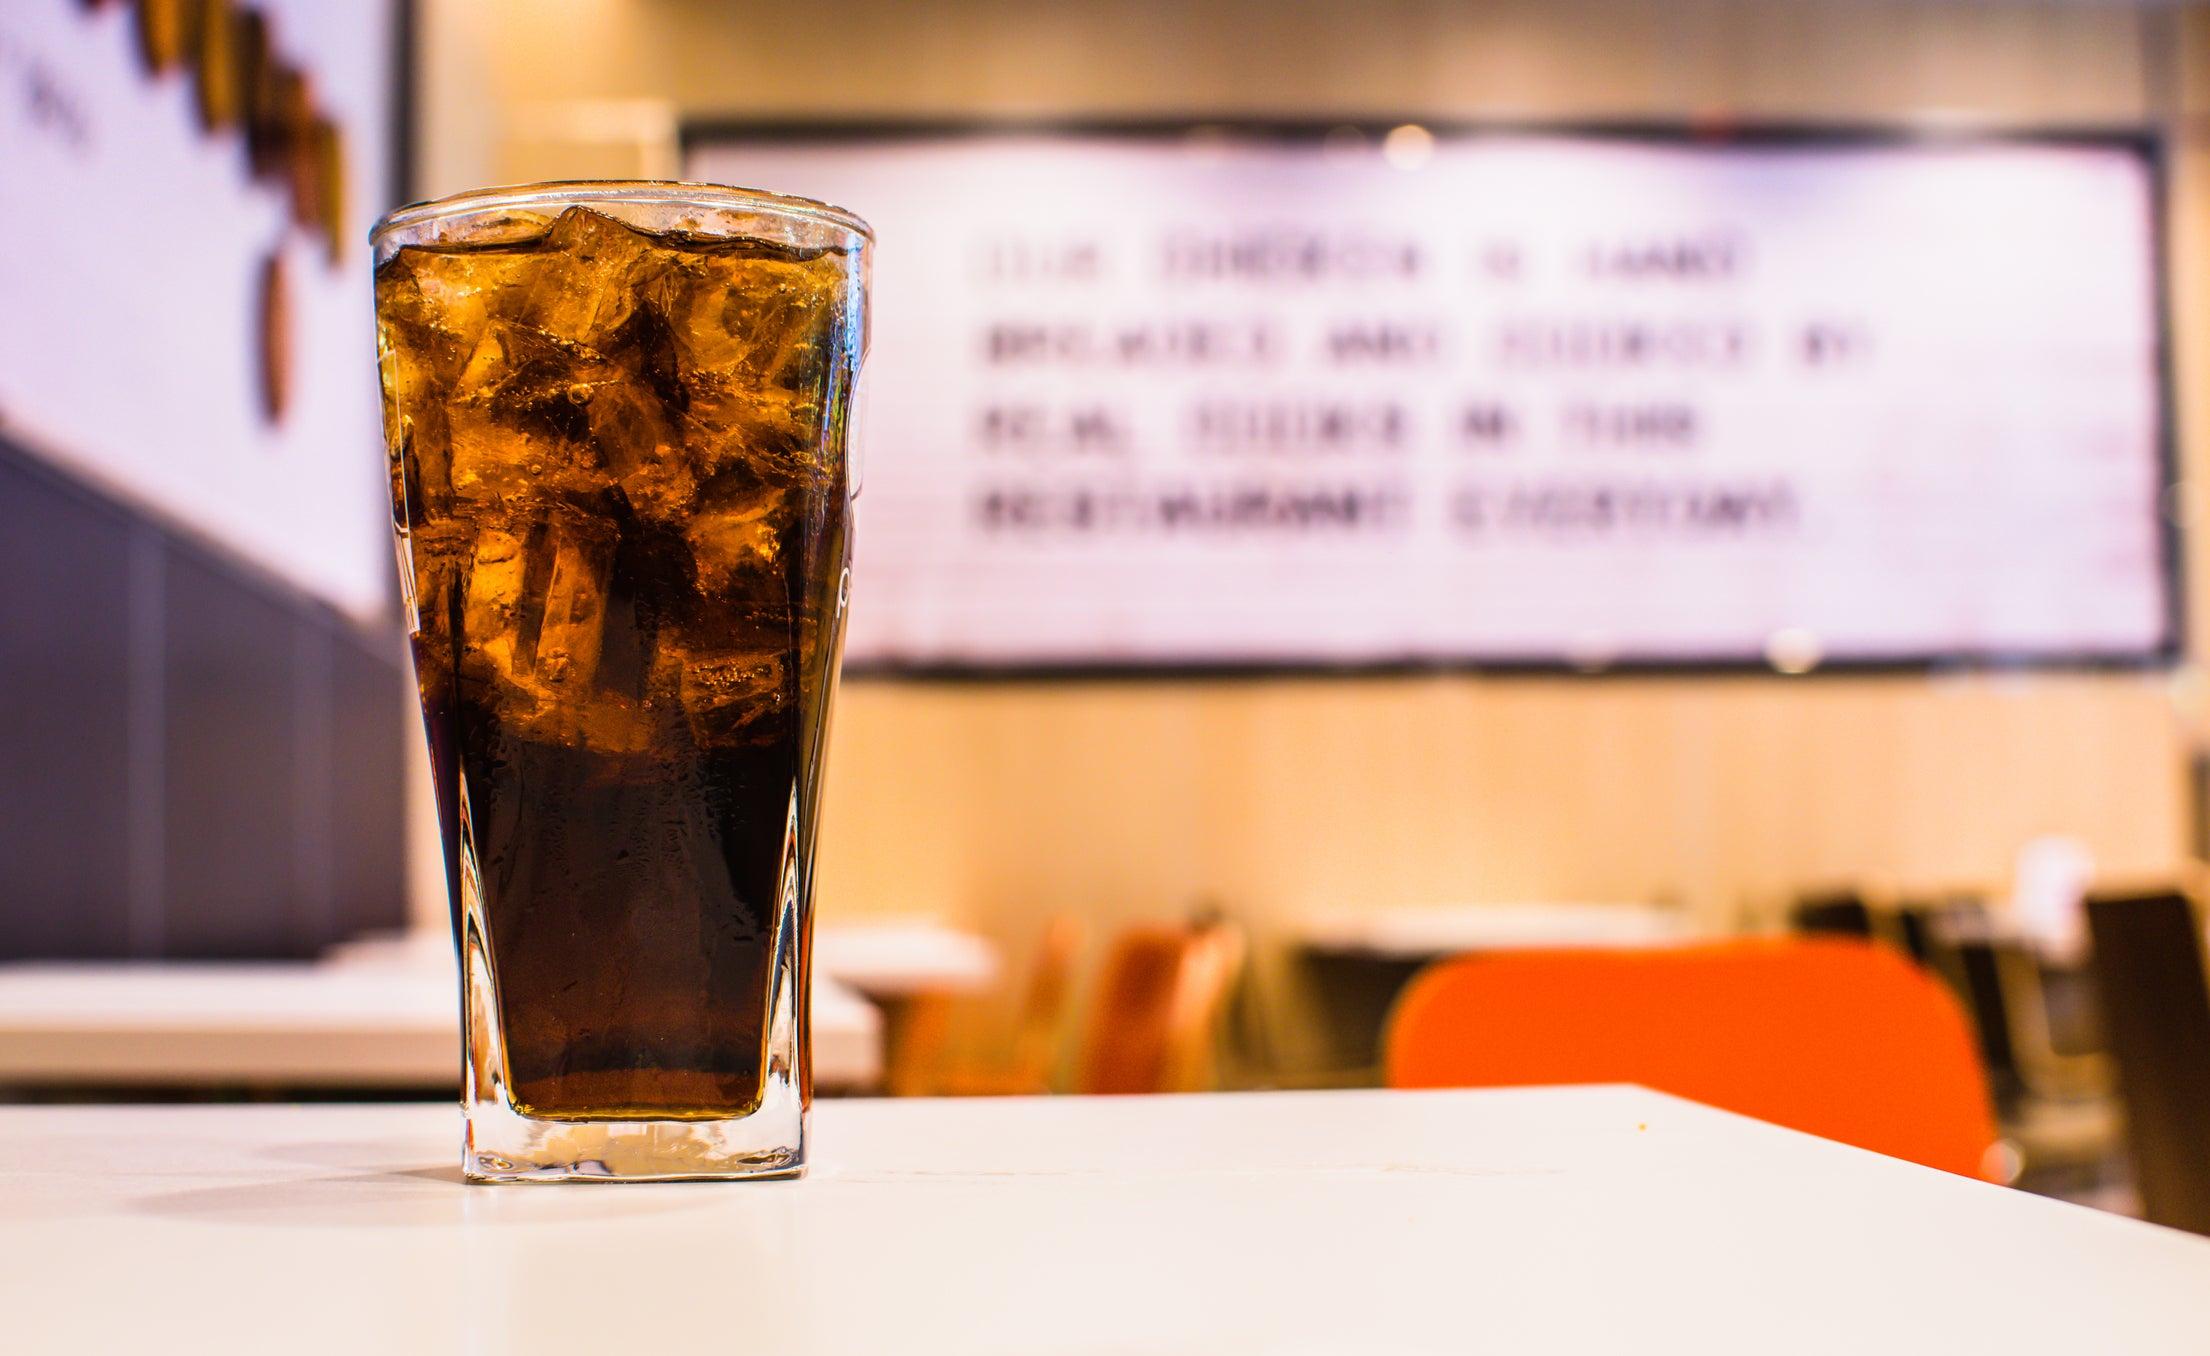 Pepsi Releasing New Vanilla And Cherry Flavors @themotleyfool #stocks $pep photo